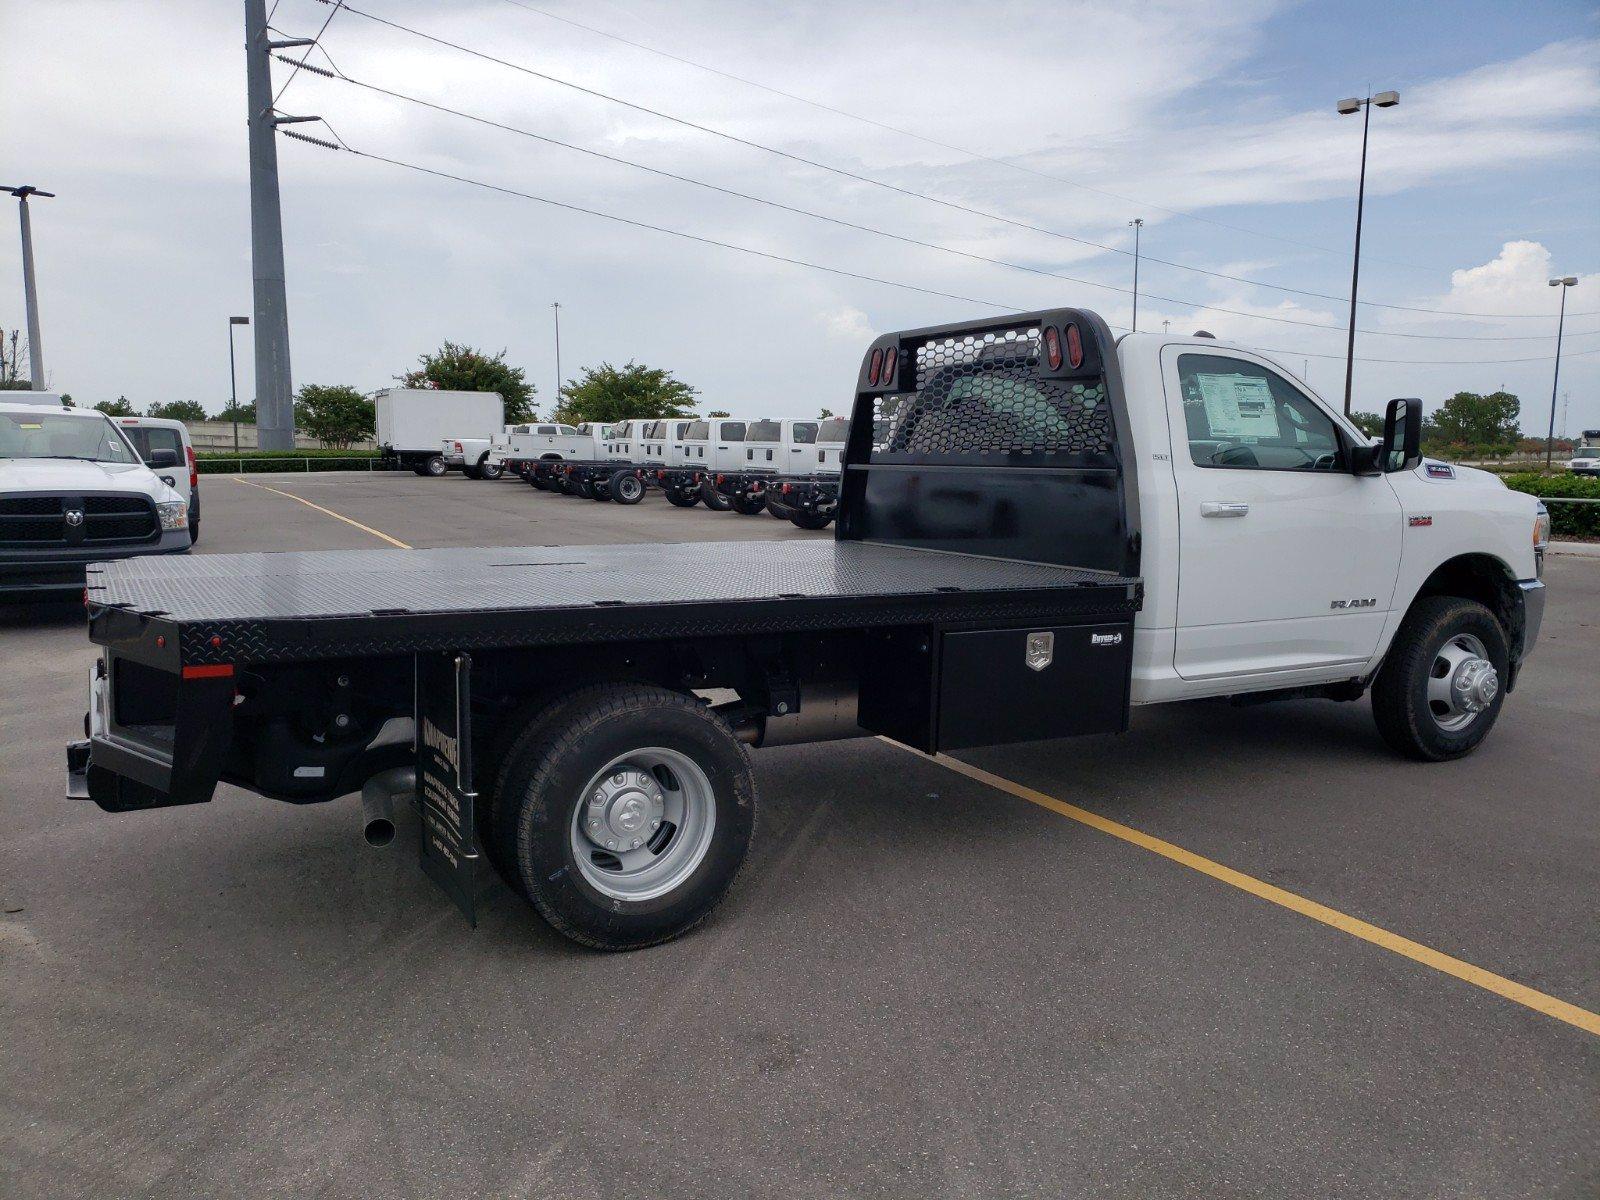 2019 Ram 3500 Regular Cab DRW 4x2, Knapheide Platform Body #G671246 - photo 1